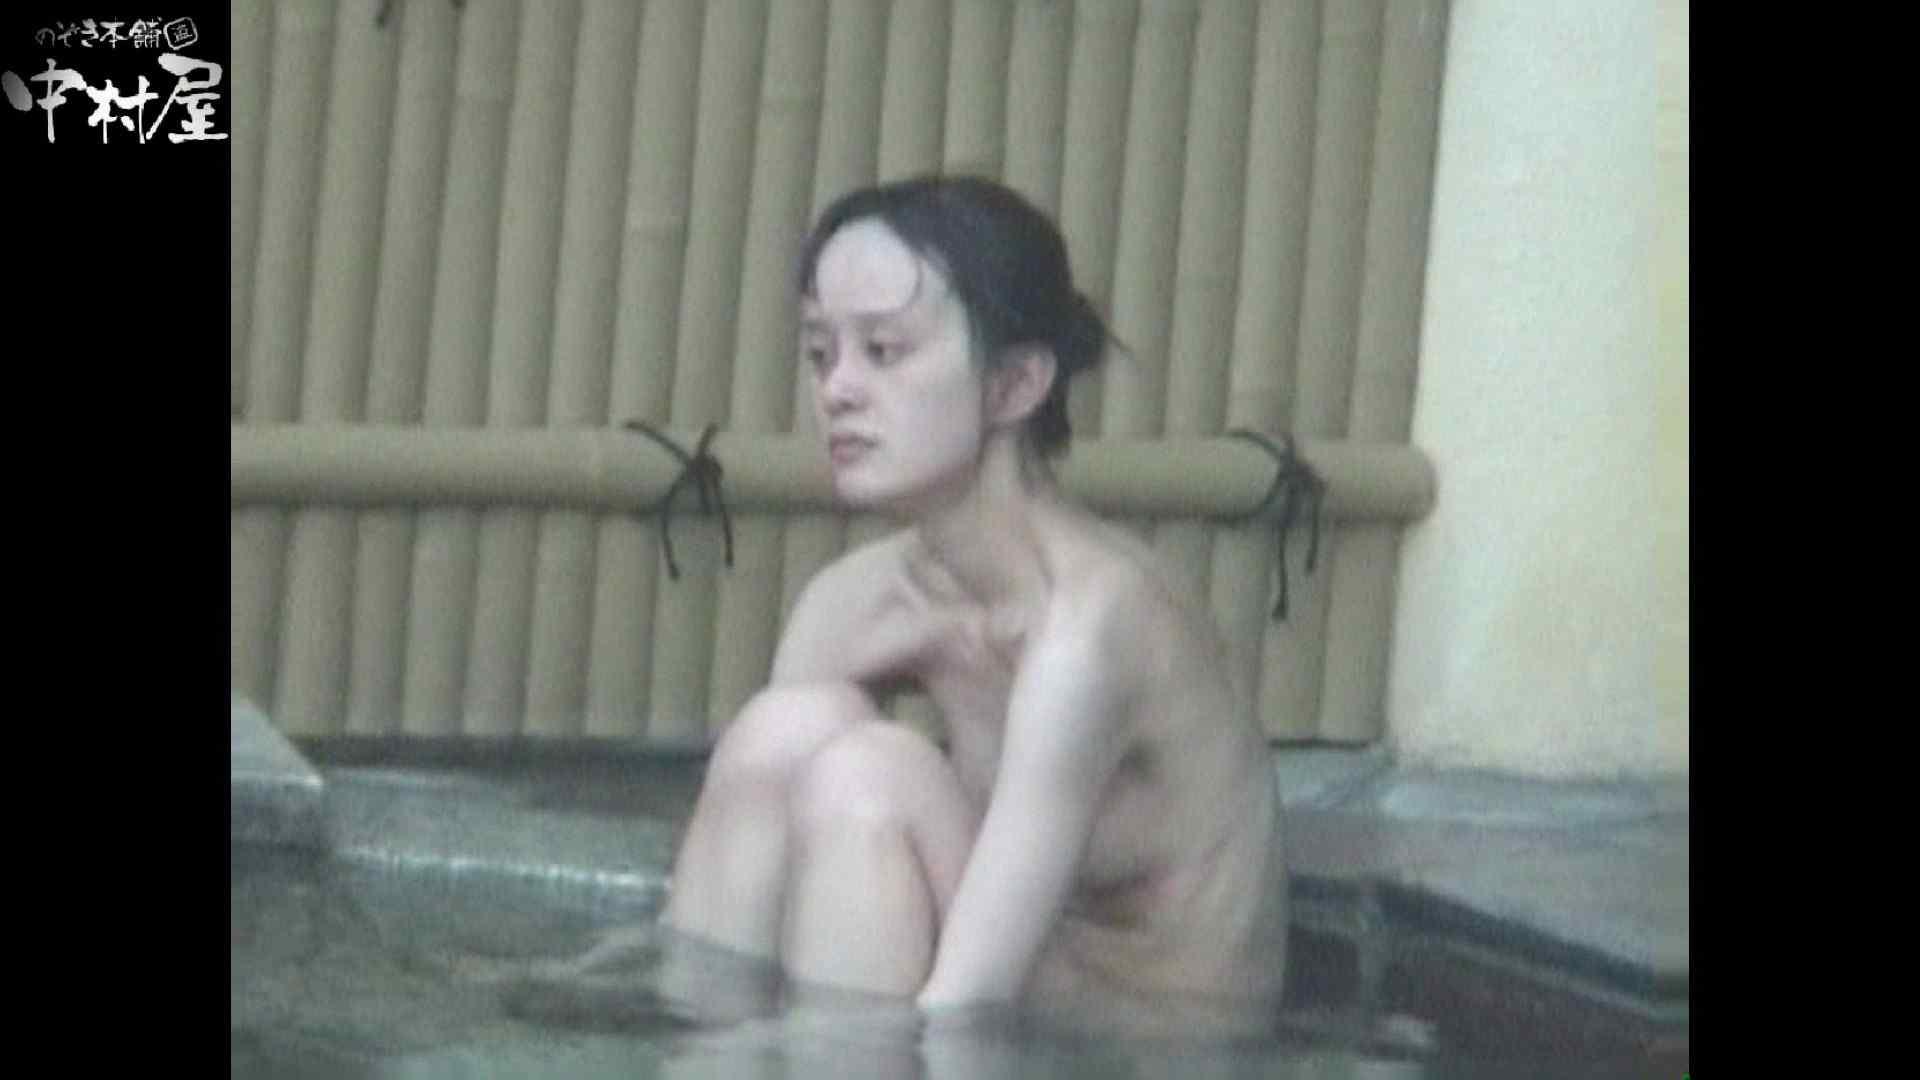 Aquaな露天風呂Vol.973 美しいOLの裸体 性交動画流出 95pic 35